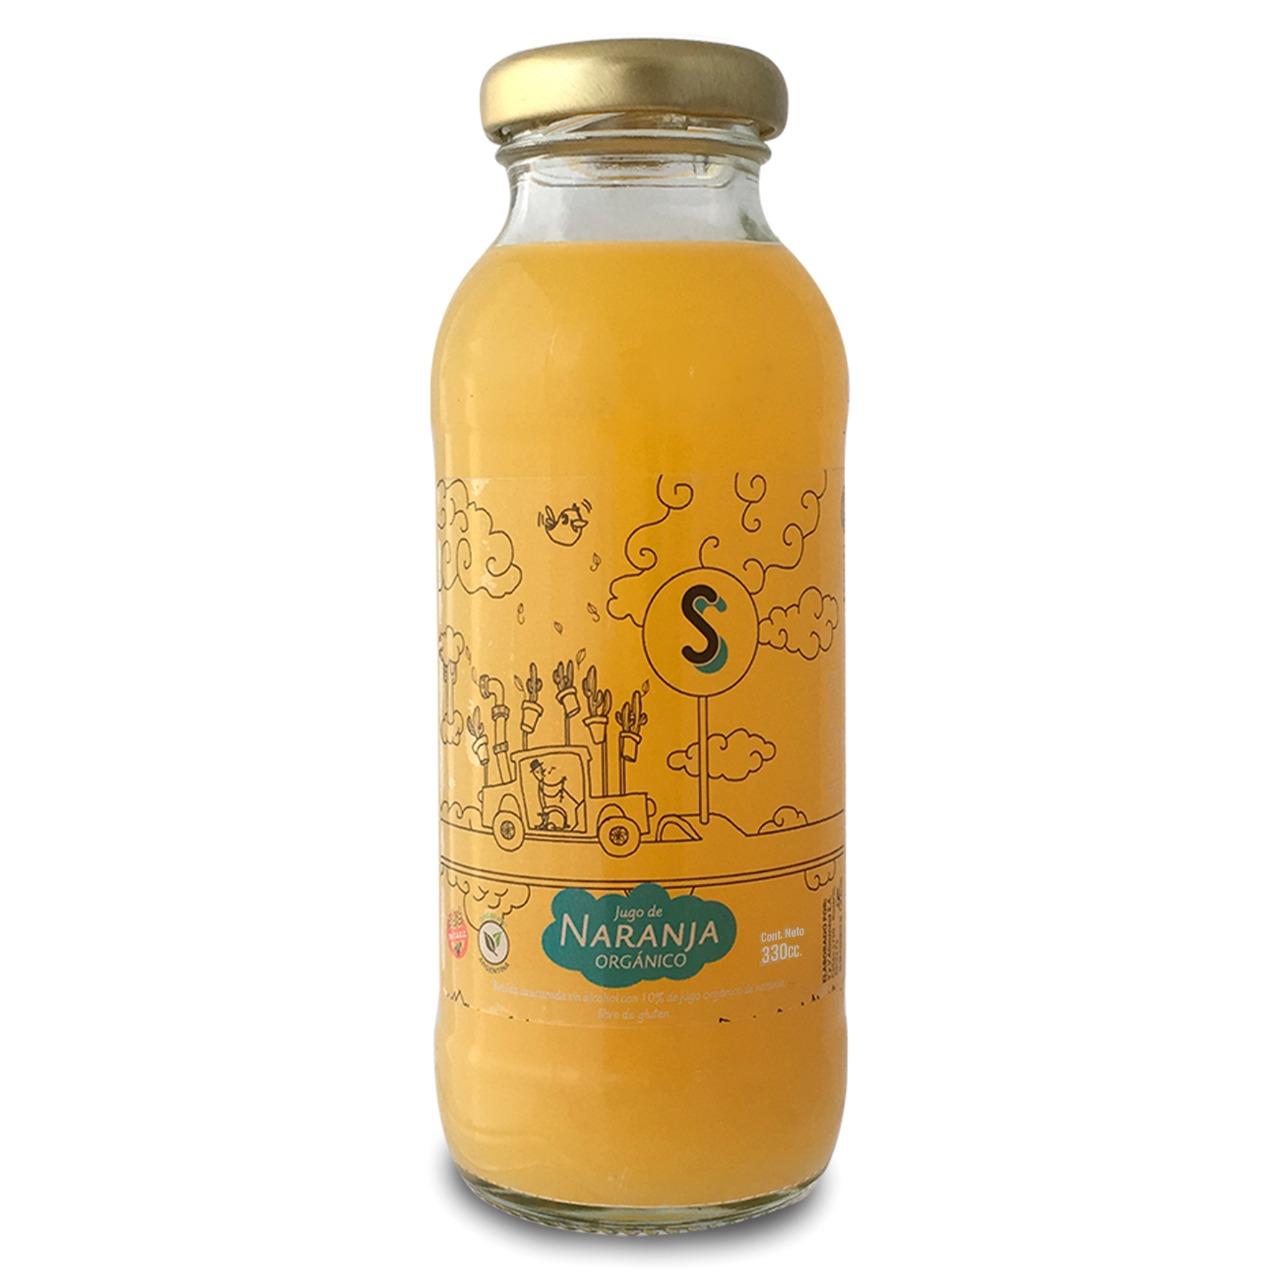 PROMO 2X1 jugo de naranja